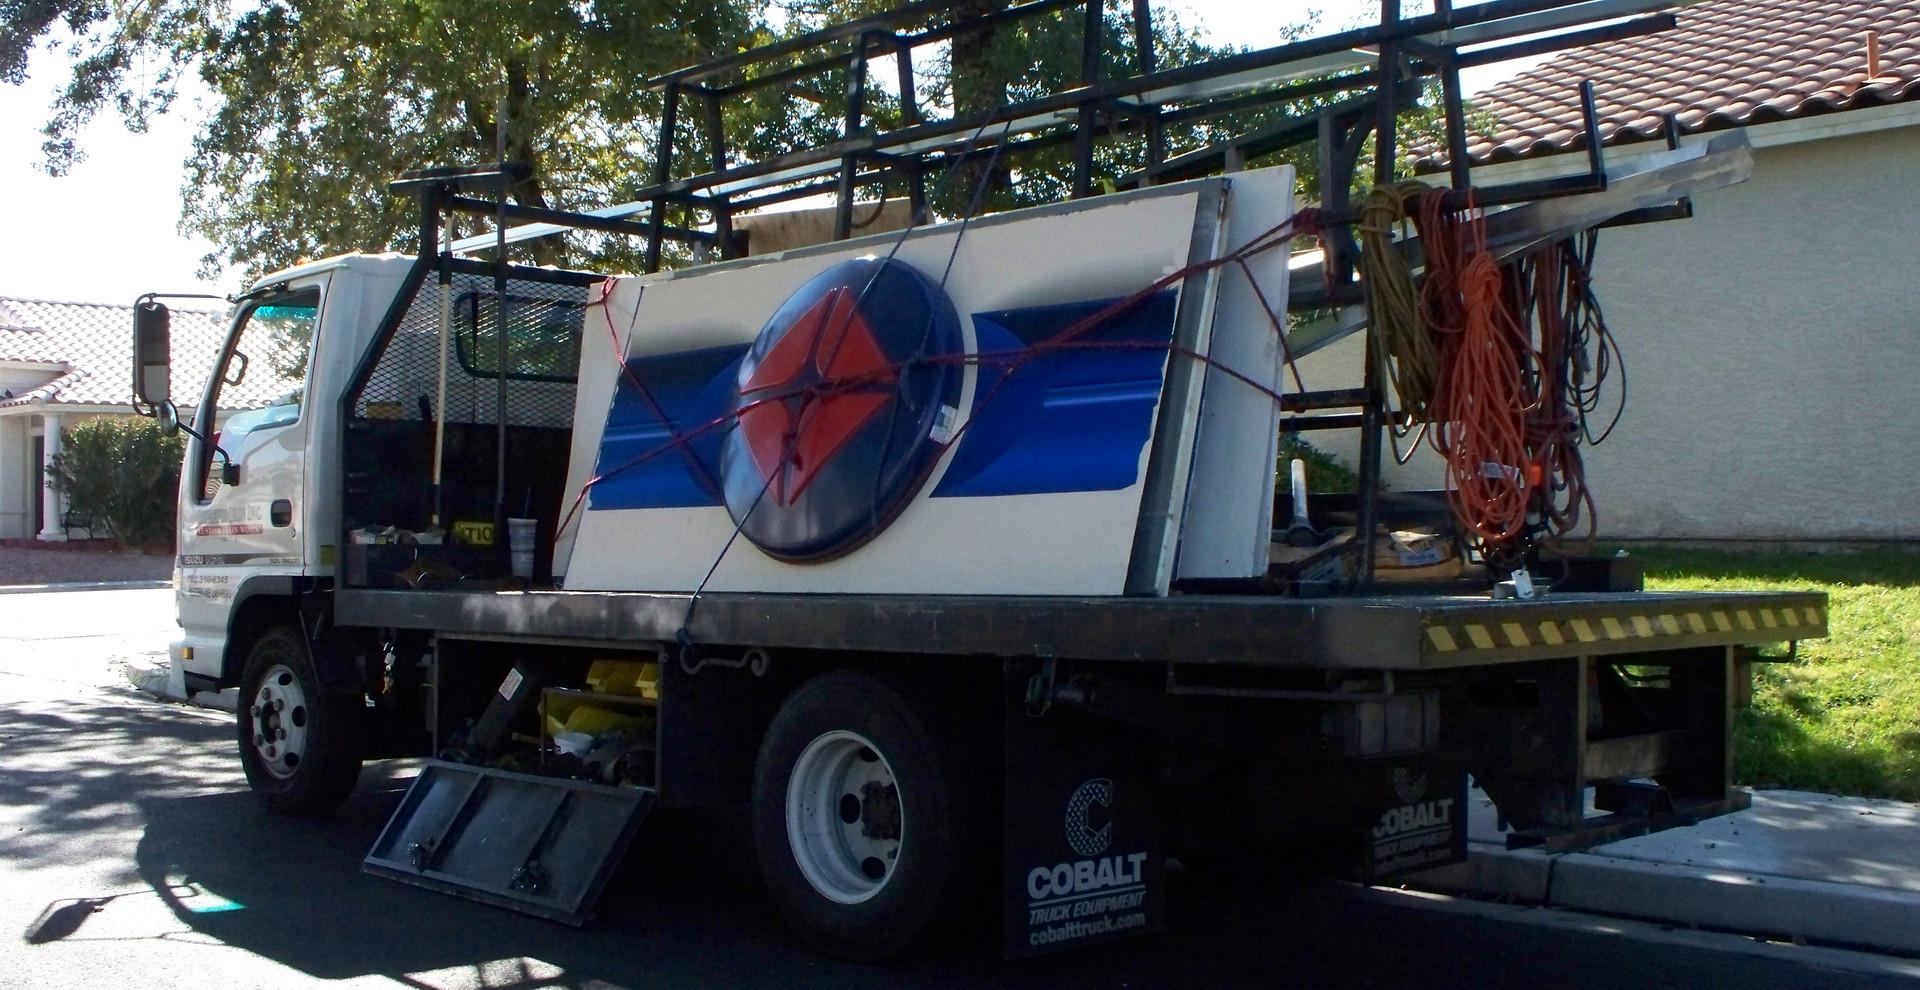 ARCO Gas Station Full Build Las Vegas - Intrepid Metal Works Inc.